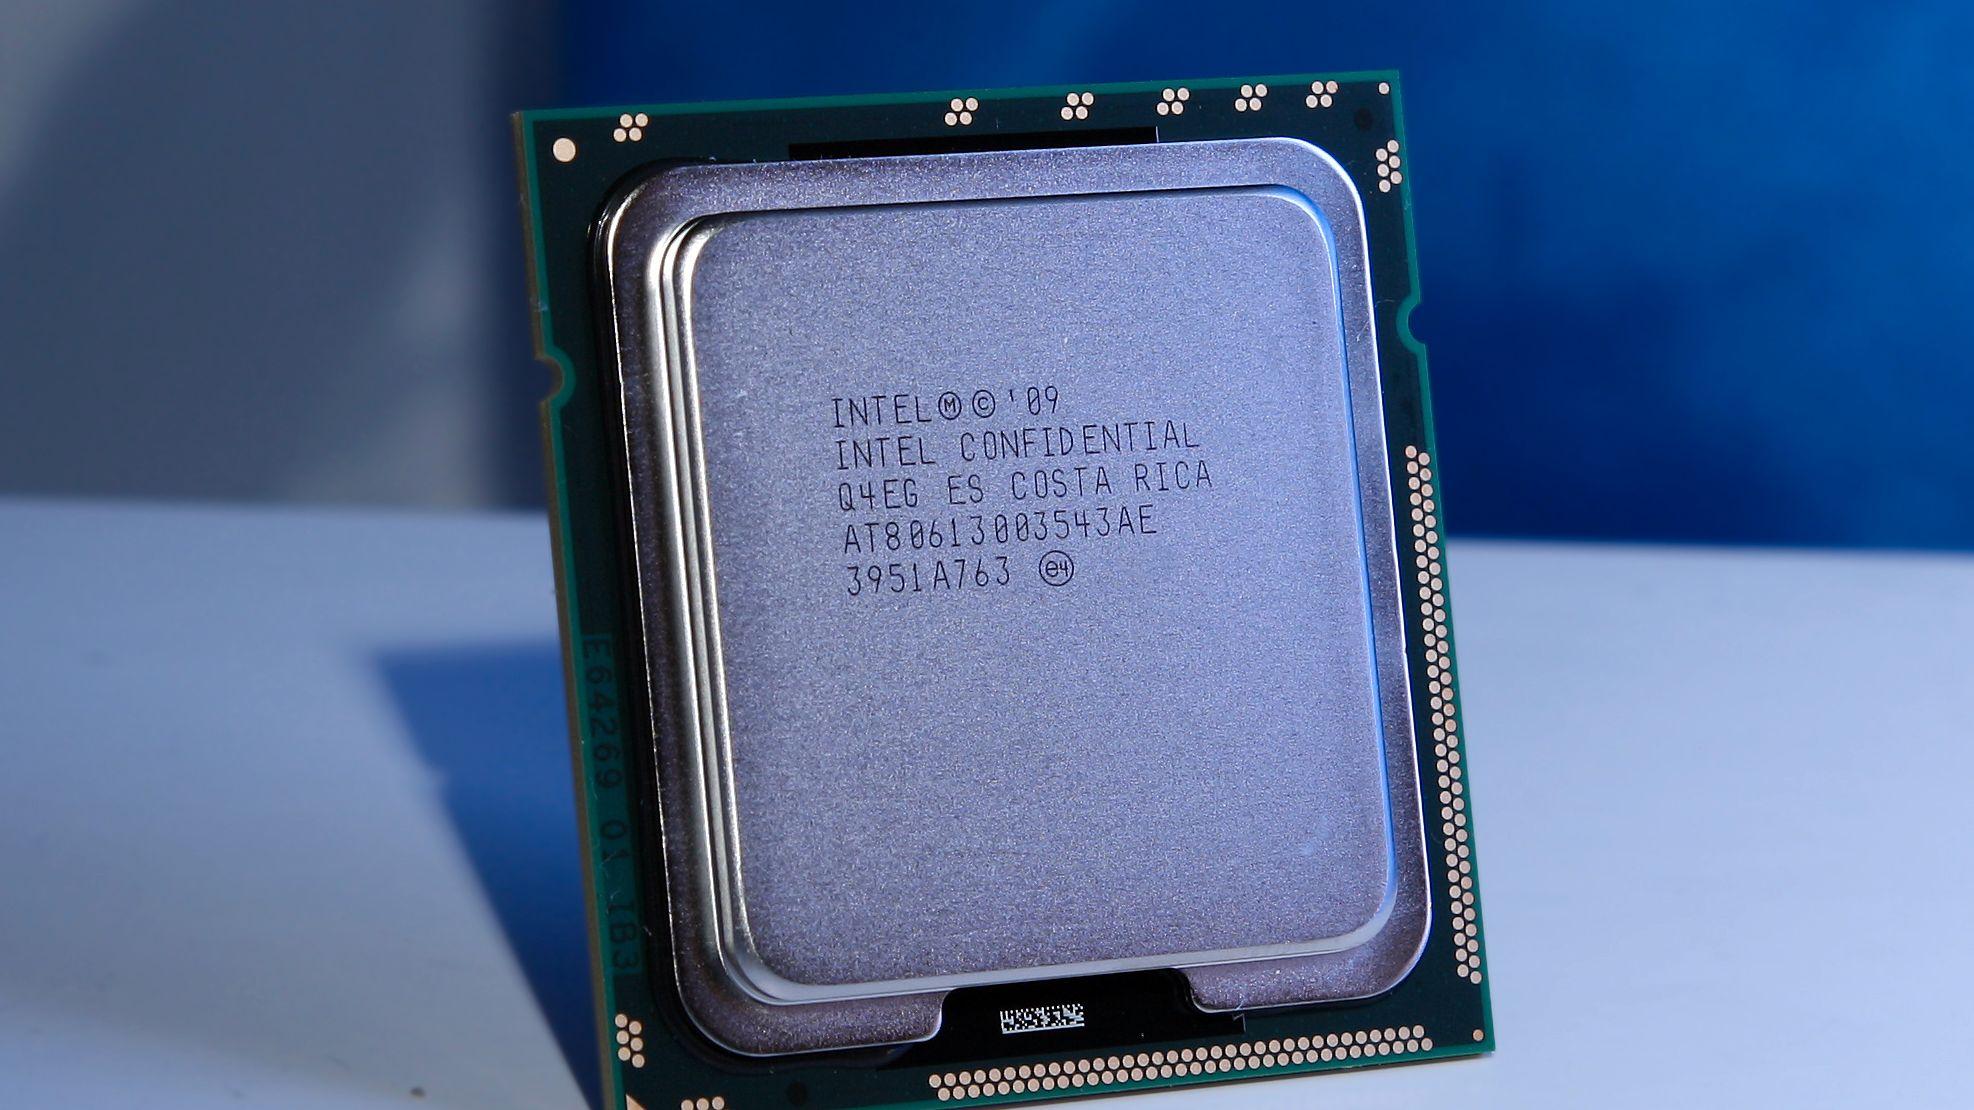 Intel Core i7 980X Extreme Edition